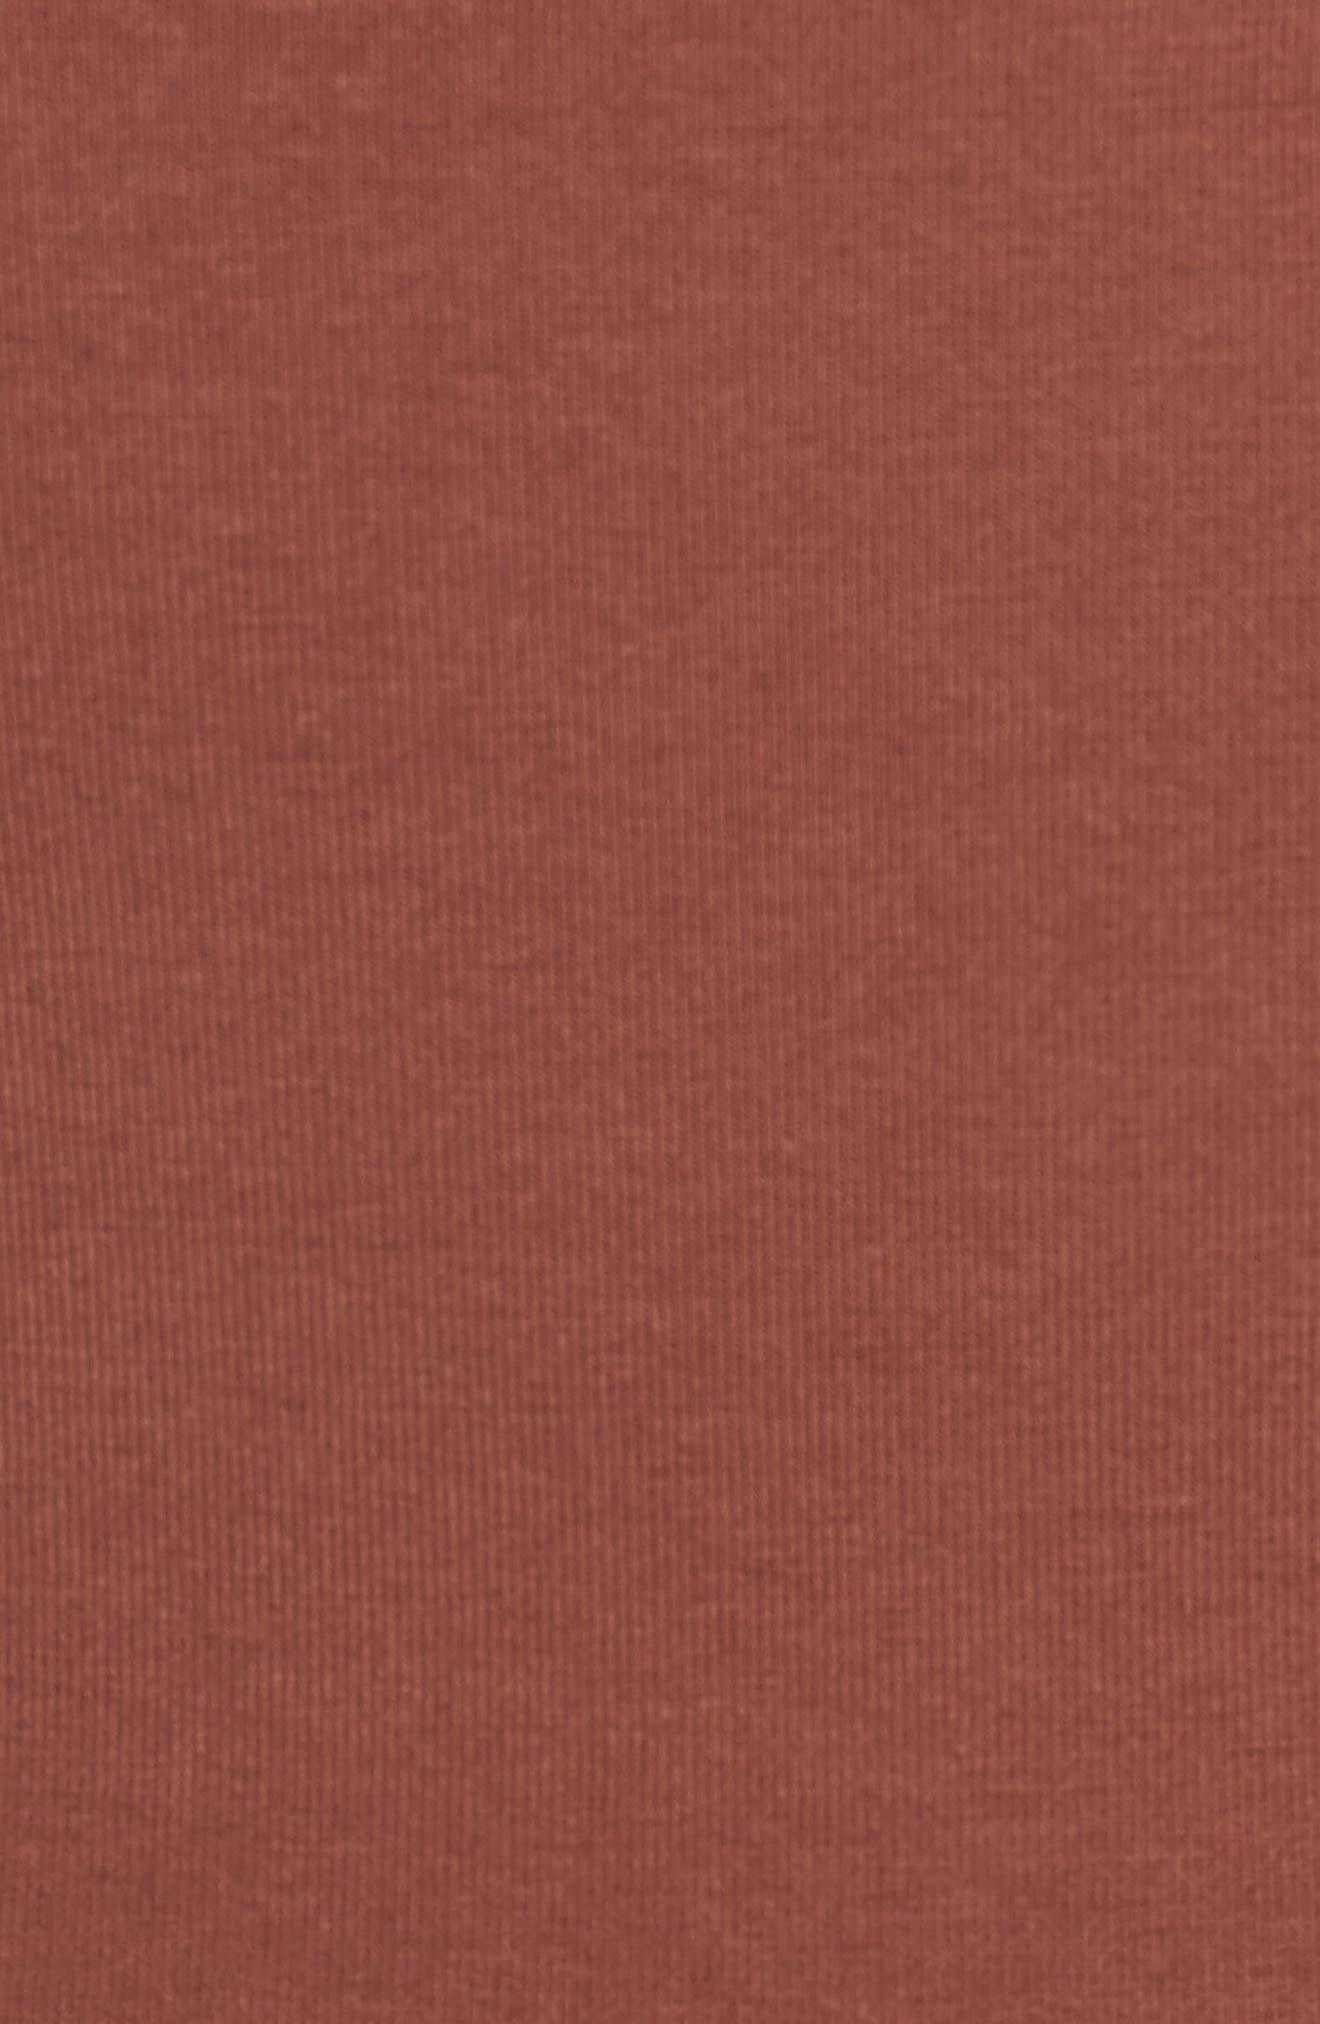 No Tuck Double Scoop Crop Camisole,                             Alternate thumbnail 6, color,                             BROWN MINK